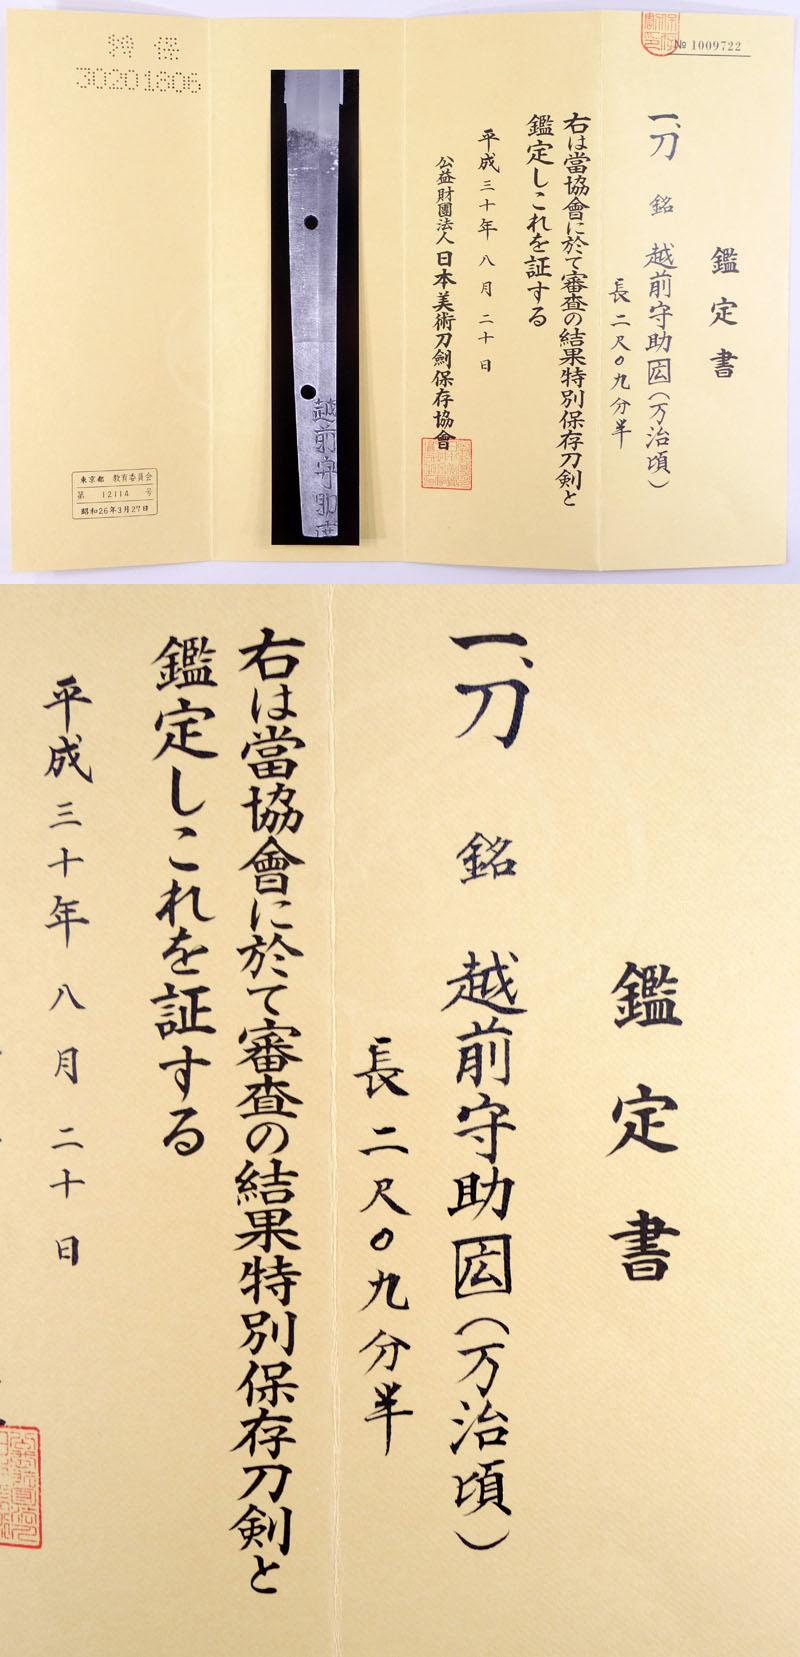 越前守助広 Picture of Certificate